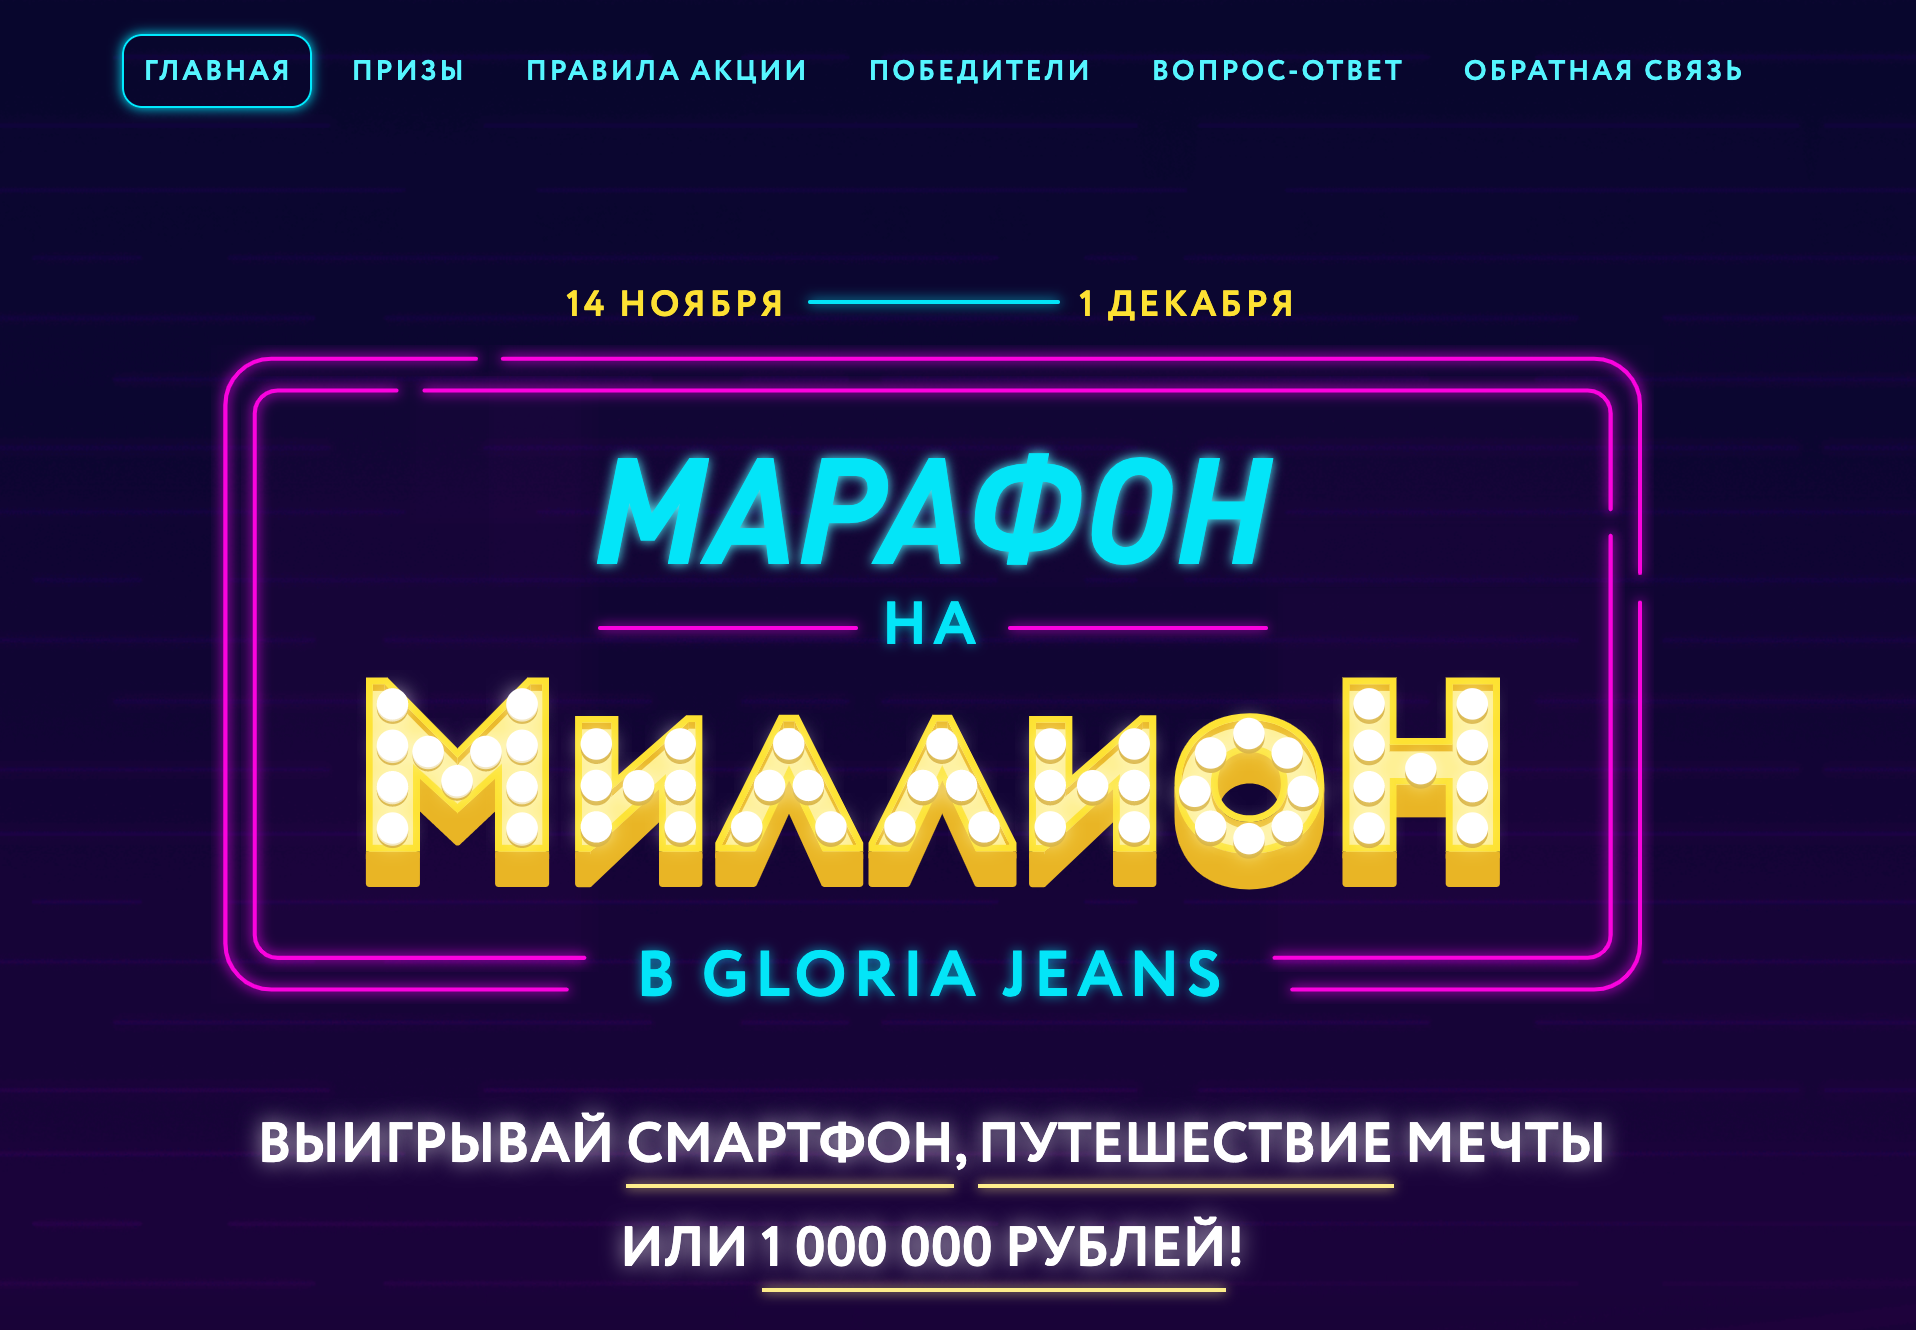 Акция Gloria Jeans марафон